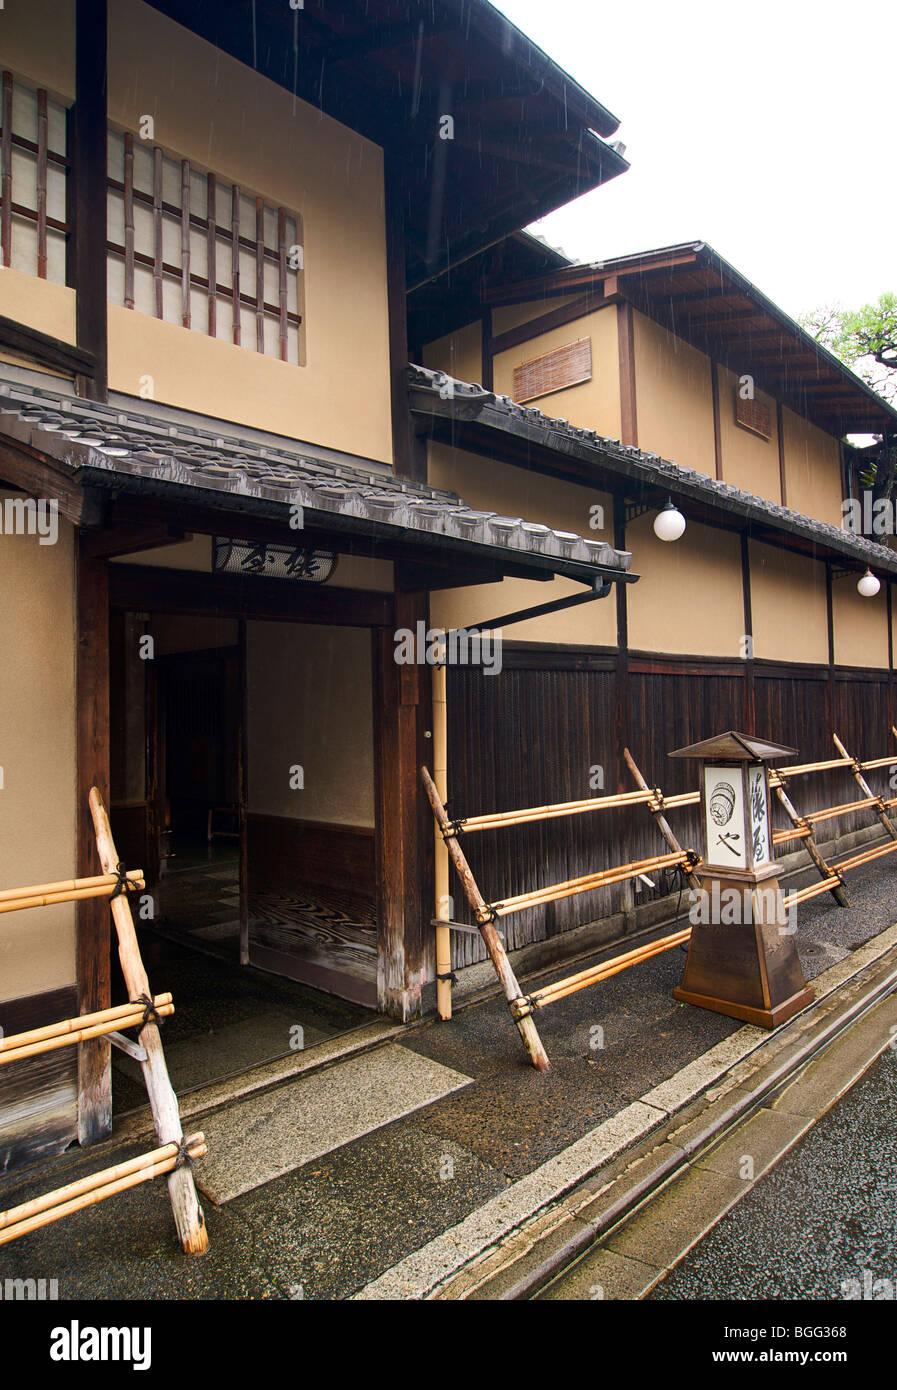 Tawaraya ryokan, Kyoto. A traditional Japanese style guest house. Japan - Stock Image